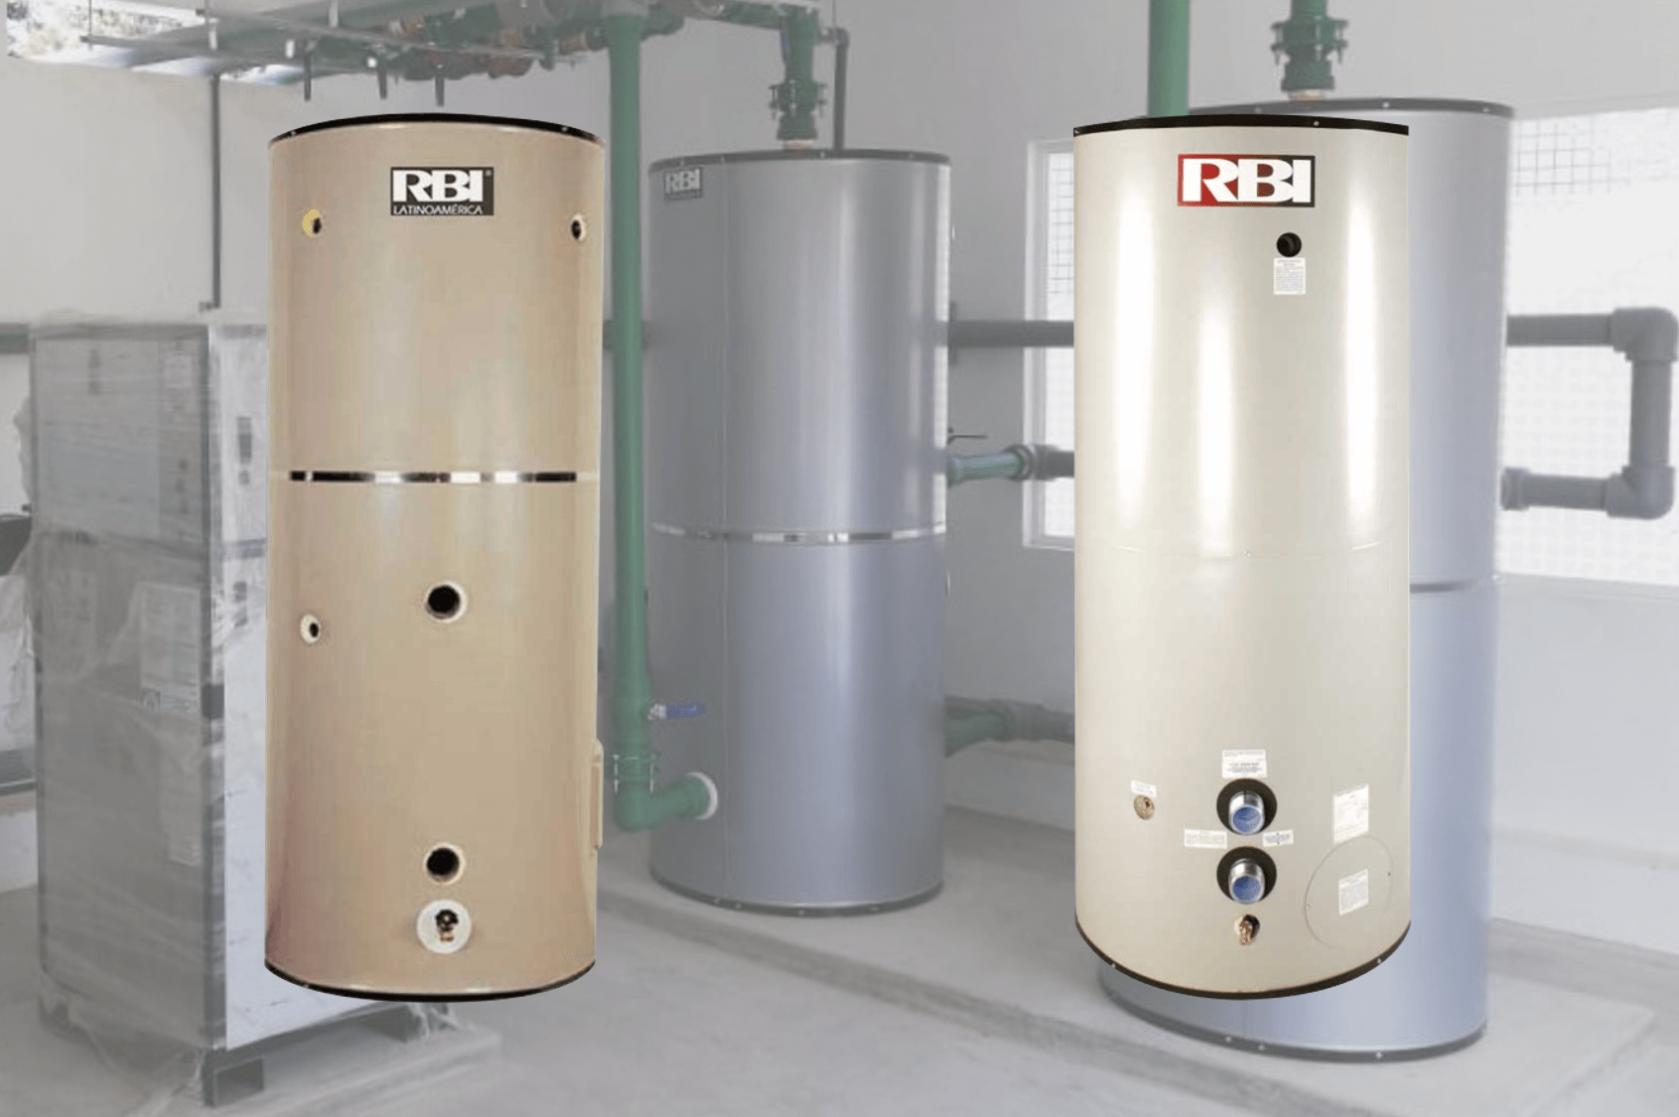 saunas-tanques-almacenamiento-2